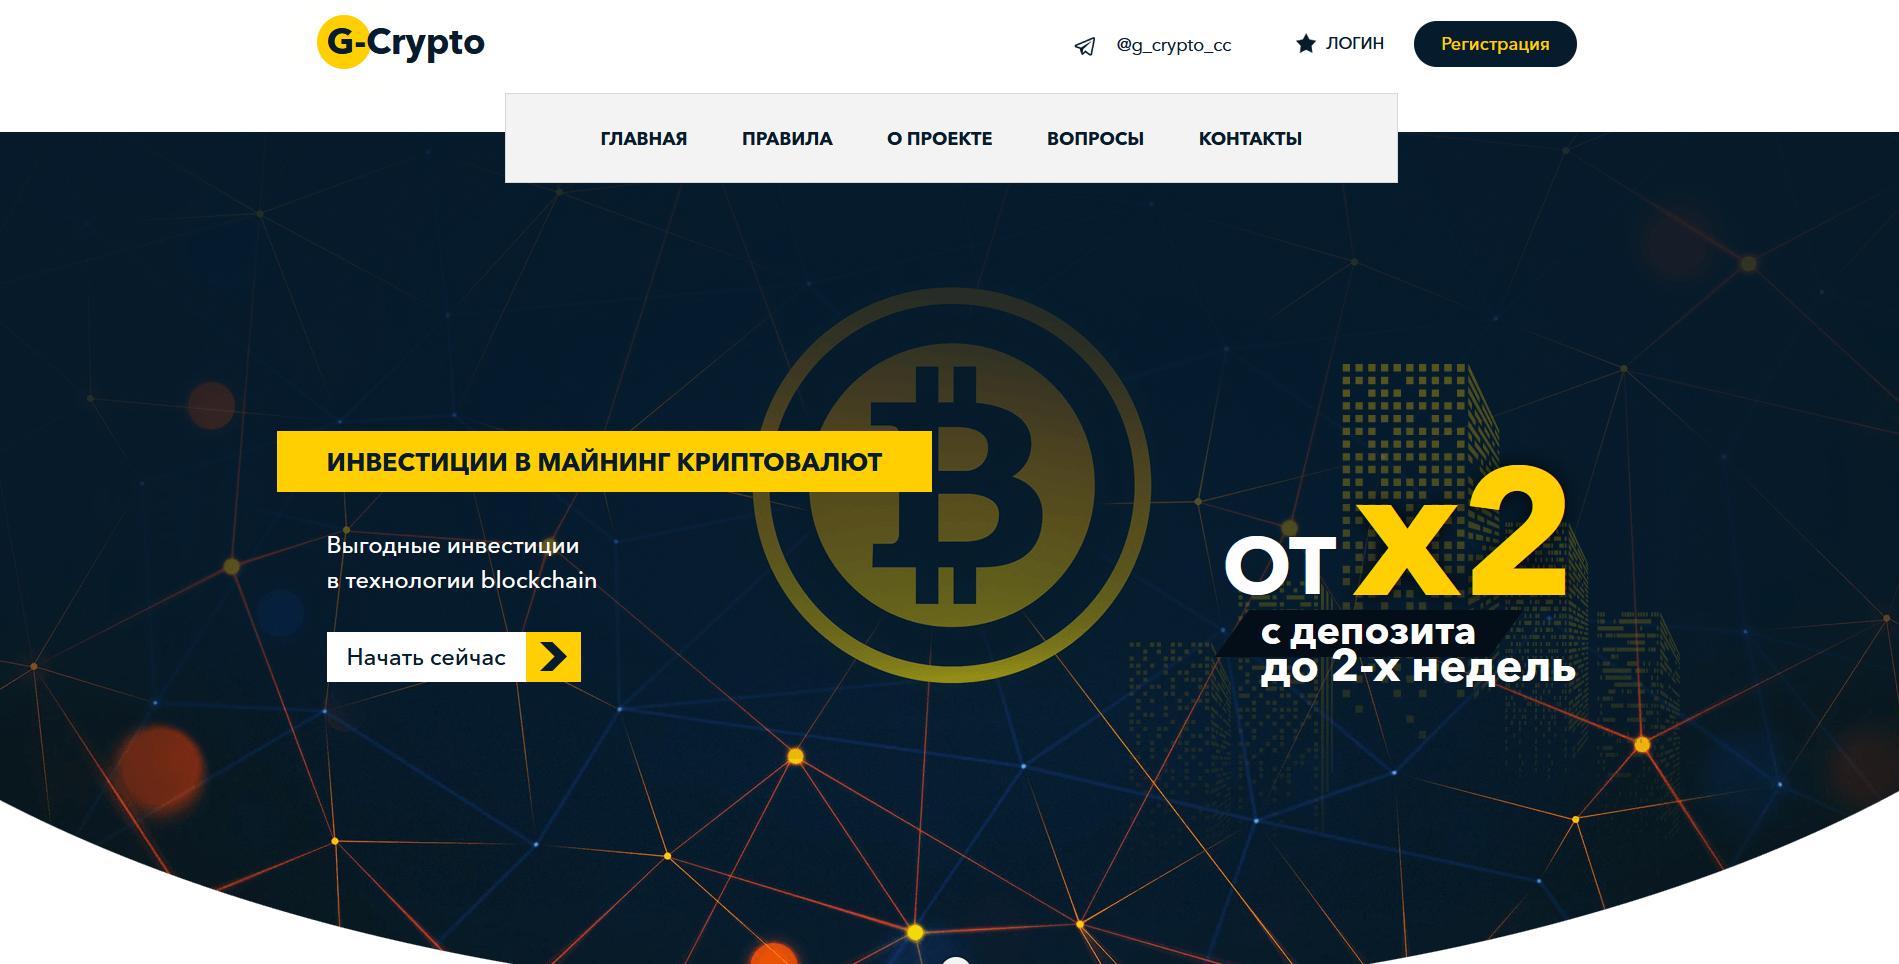 G-Crypto - g-crypto.cc